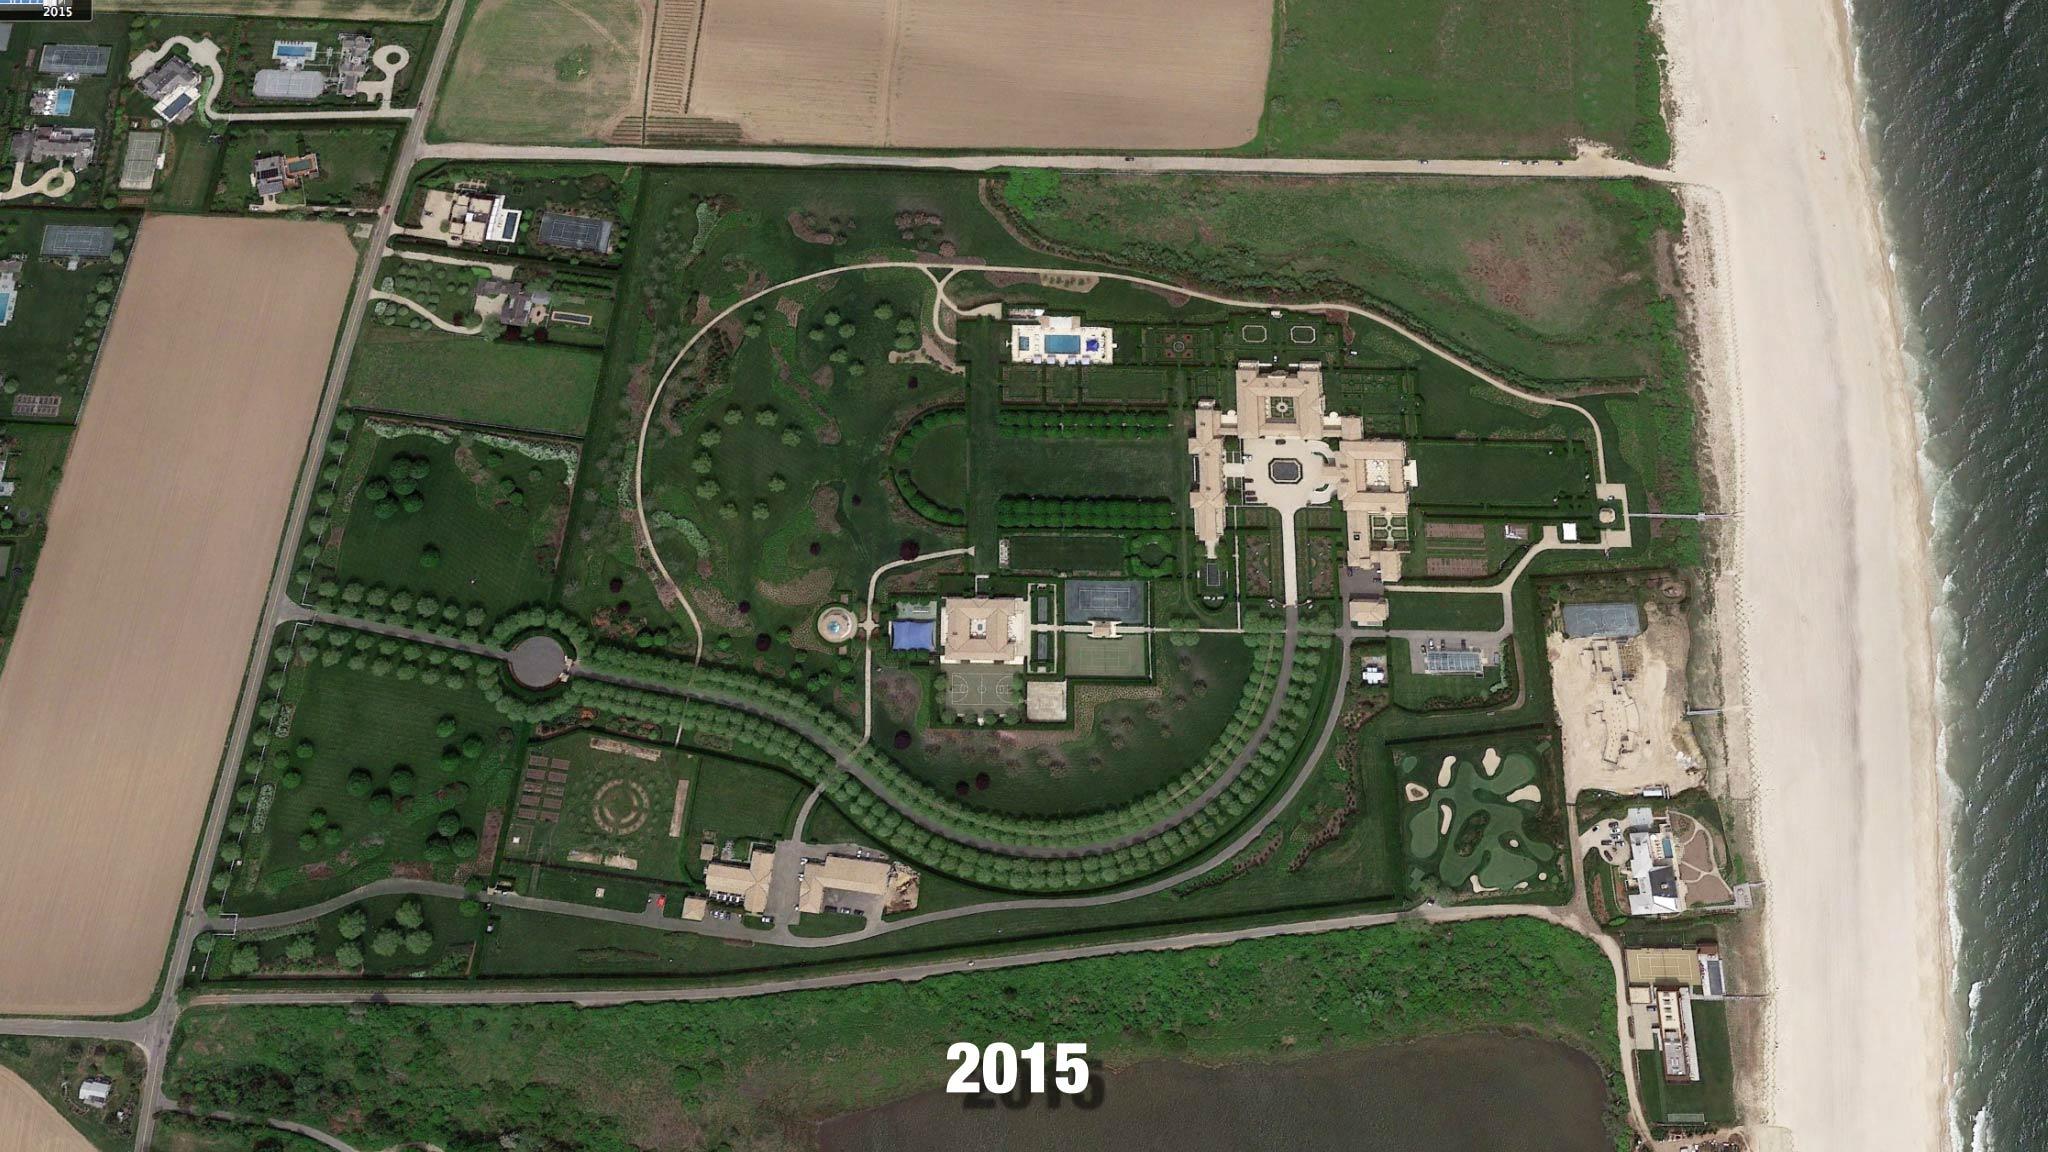 C_OBH_Hamptons_Satellite_2k_Static_Rennert_After_Year.jpg